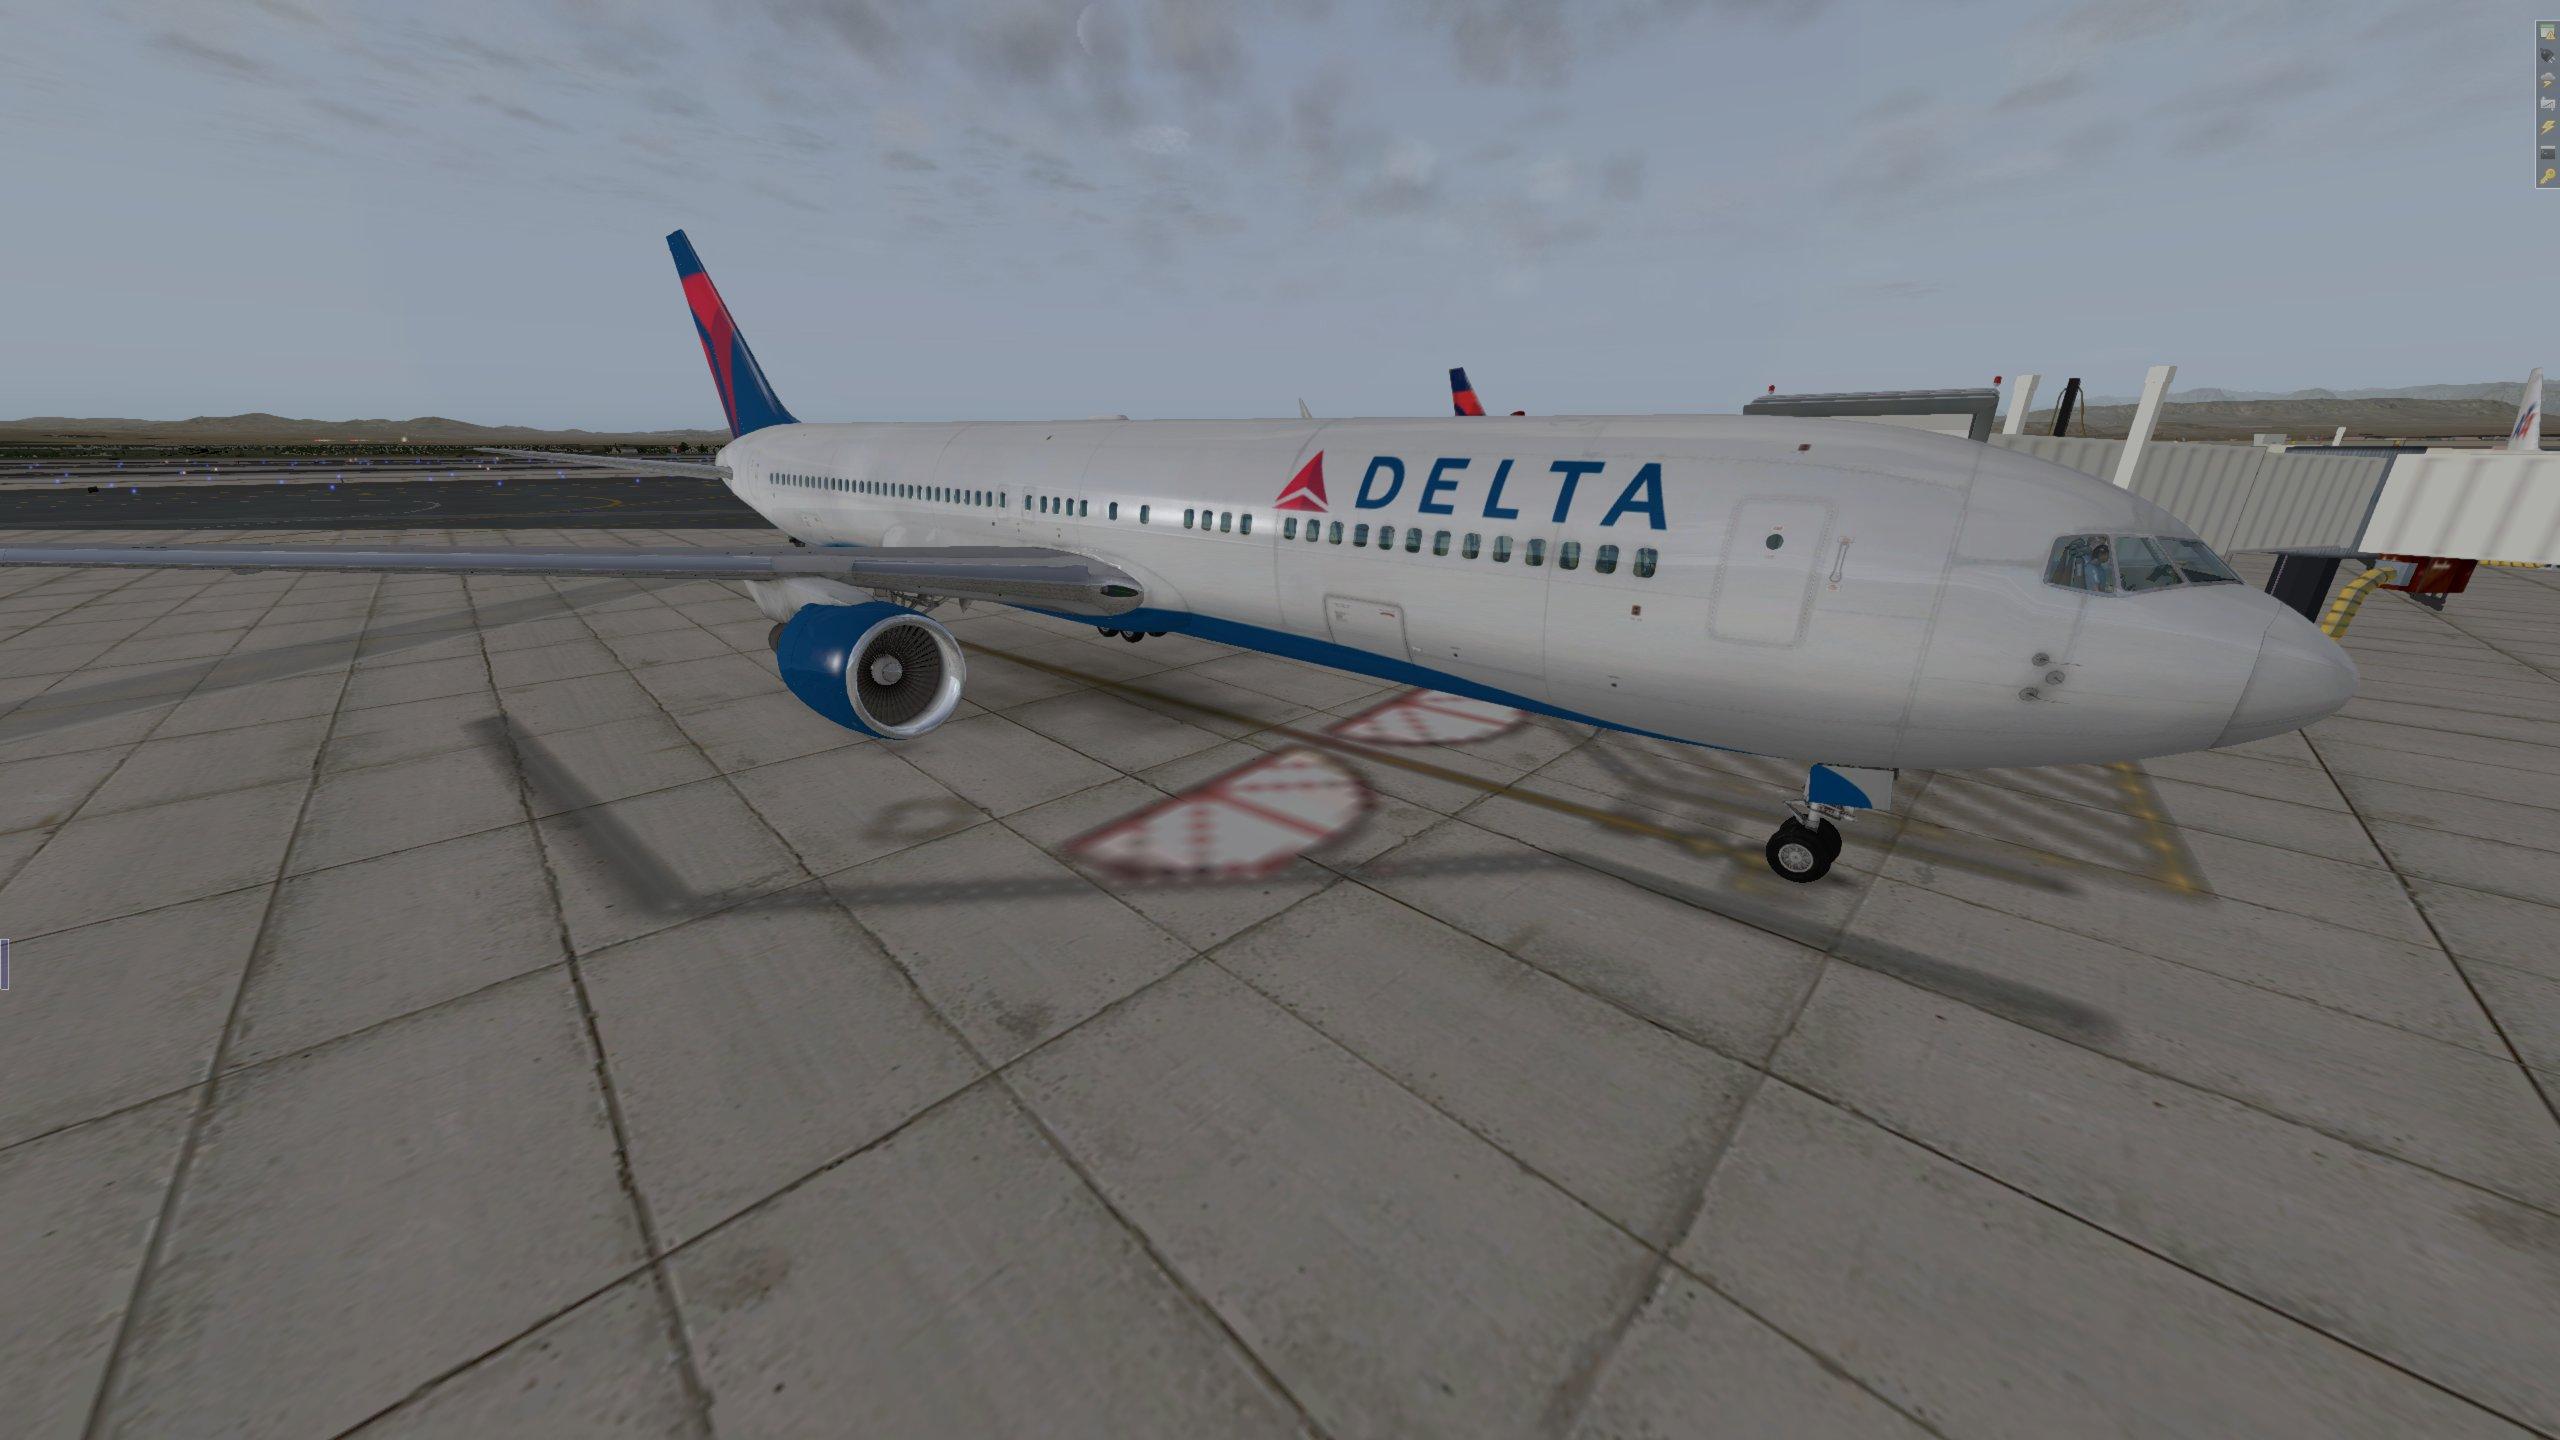 FF 767-300 Delta Livery - Aircraft Skins - Liveries - X